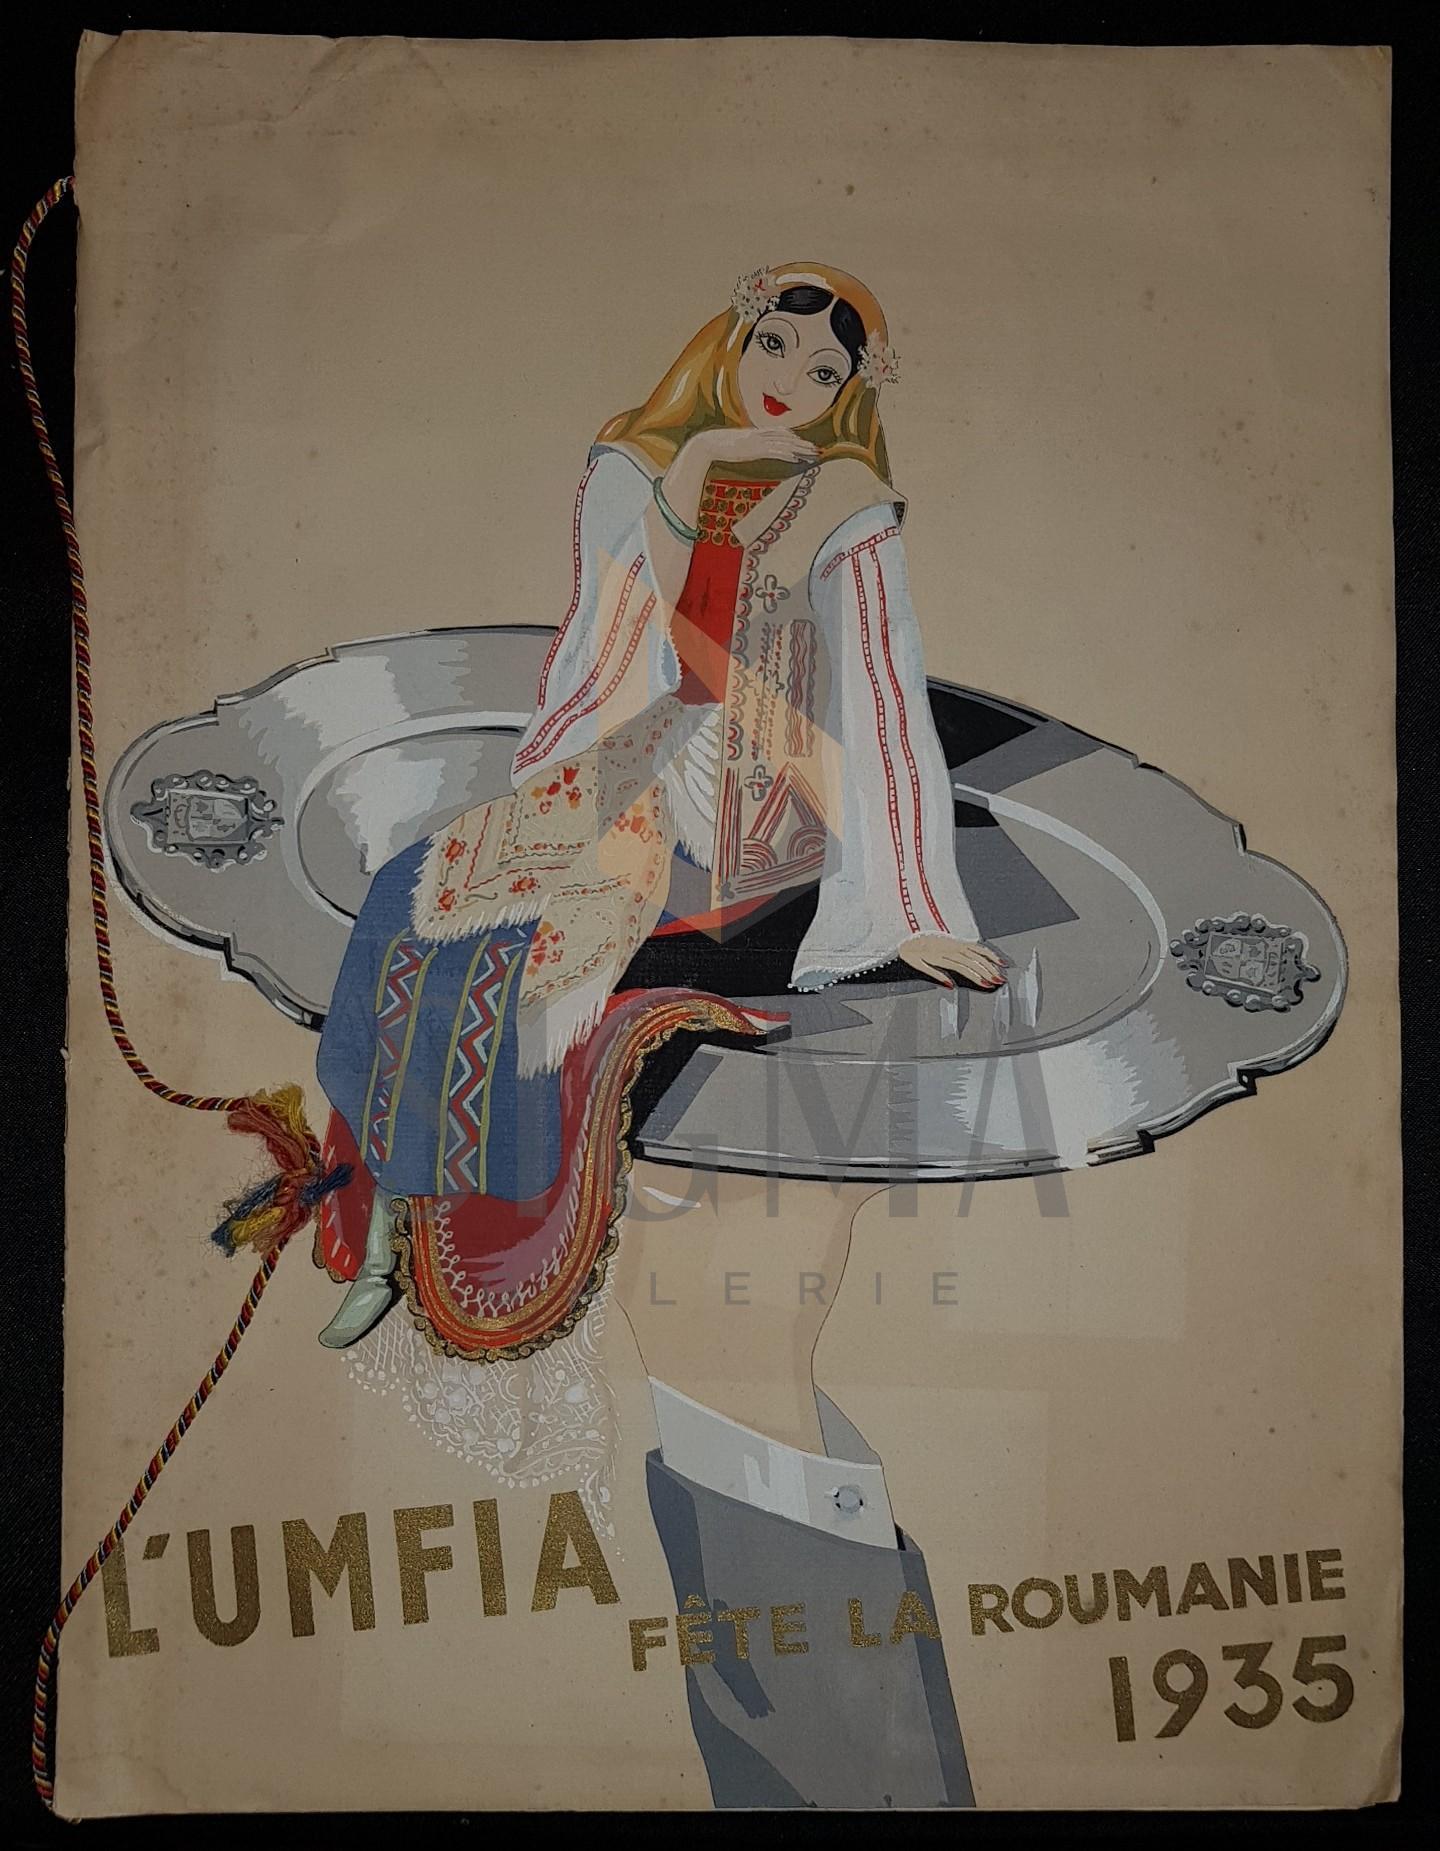 MENIU, L'UMFIA FETE LA ROUMANIE 1935 (Ce II Avril 1935, Palais D'Orsay), Cromolitografie (Posibil LENA CONSTANTE!)